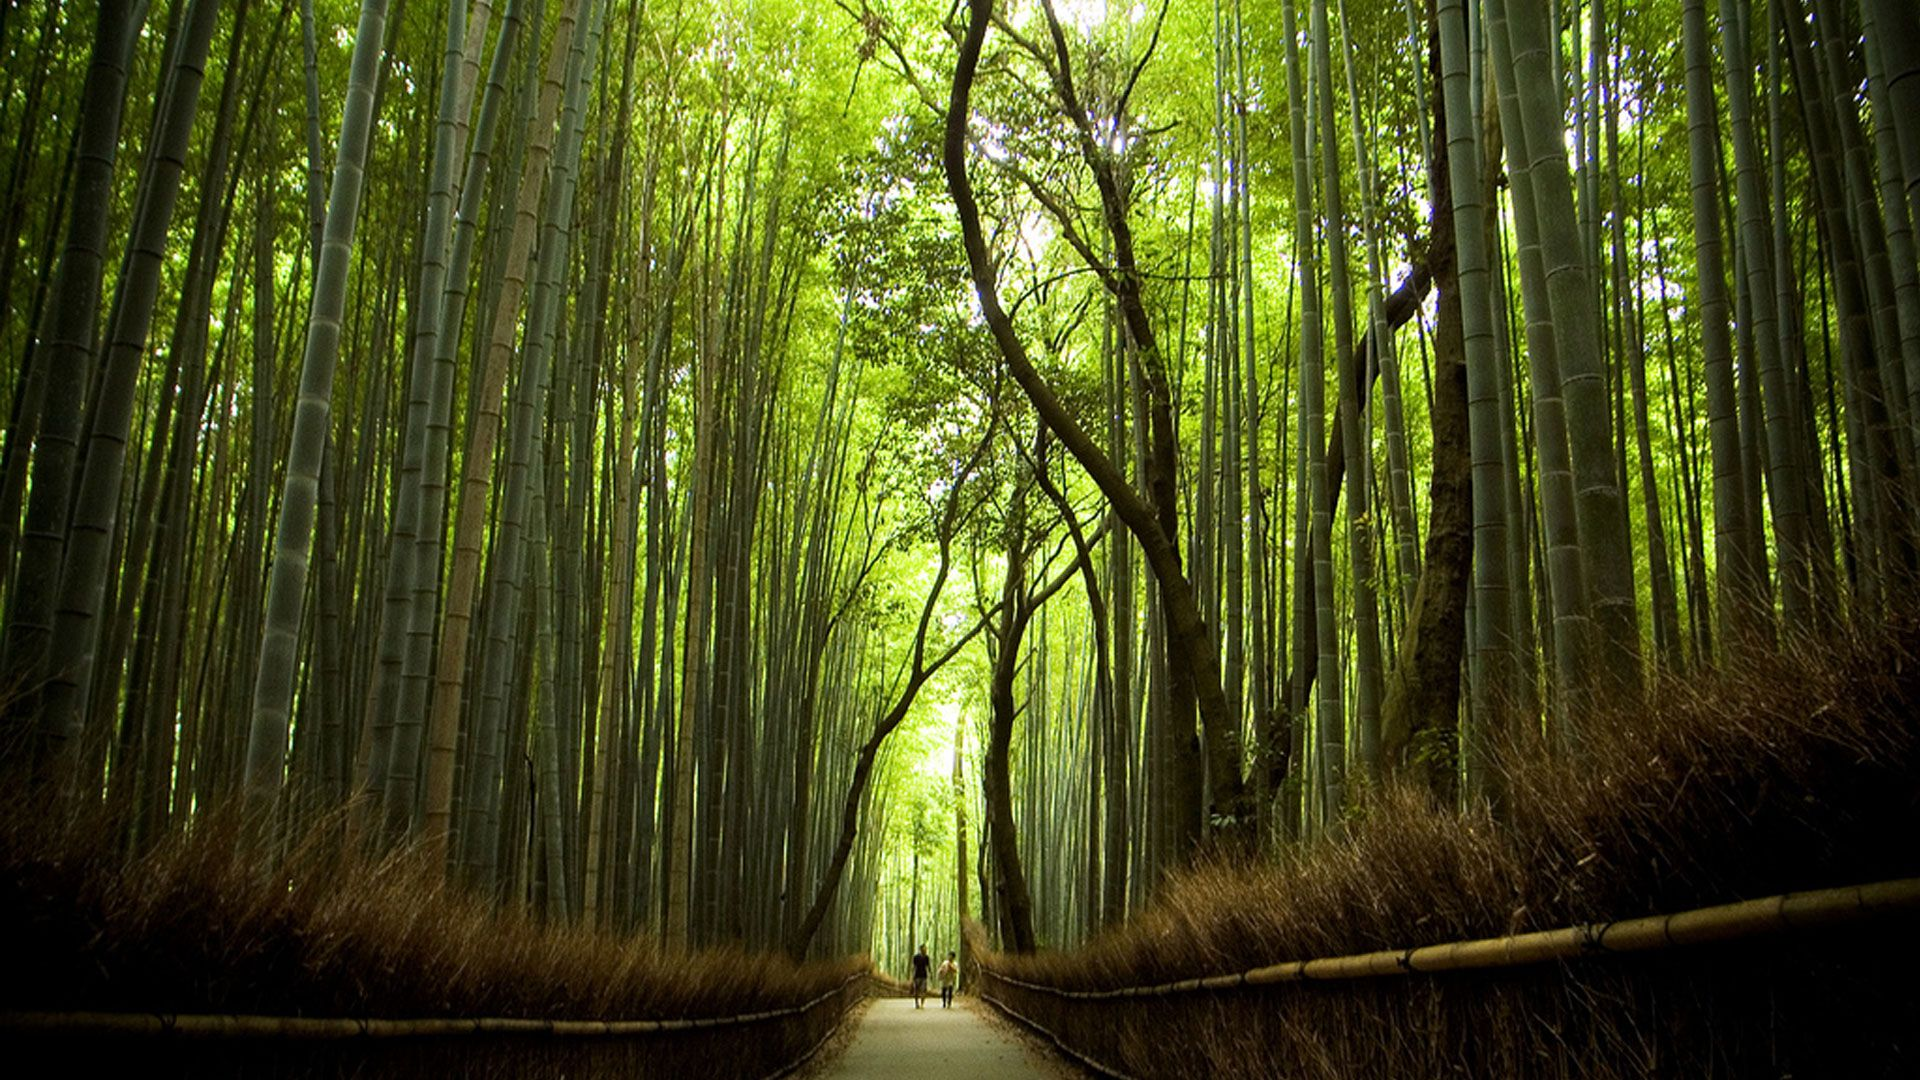 Sagano bamboo woods near Kyoto